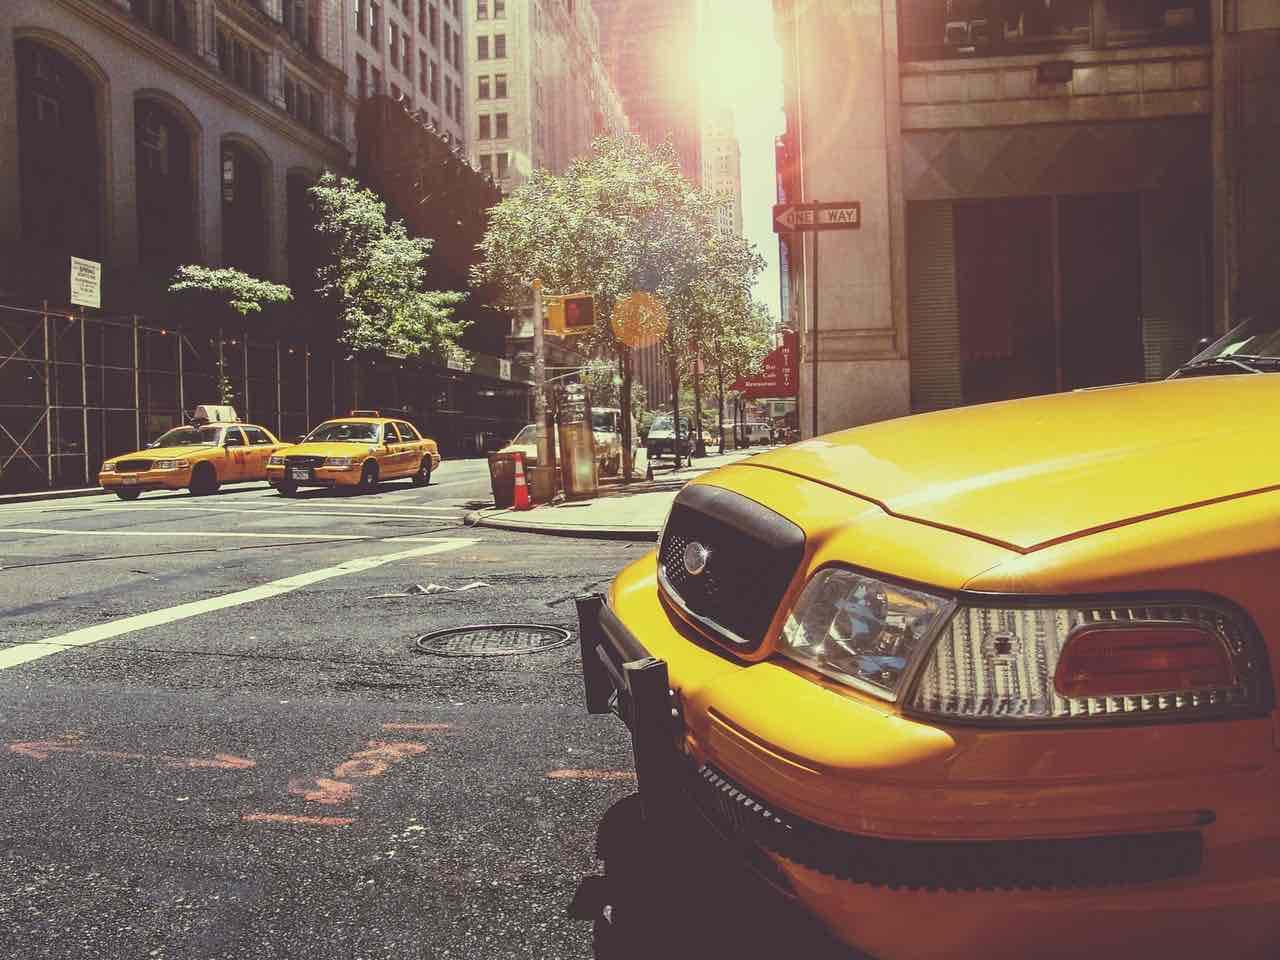 city-cars-vehicles-street (1)